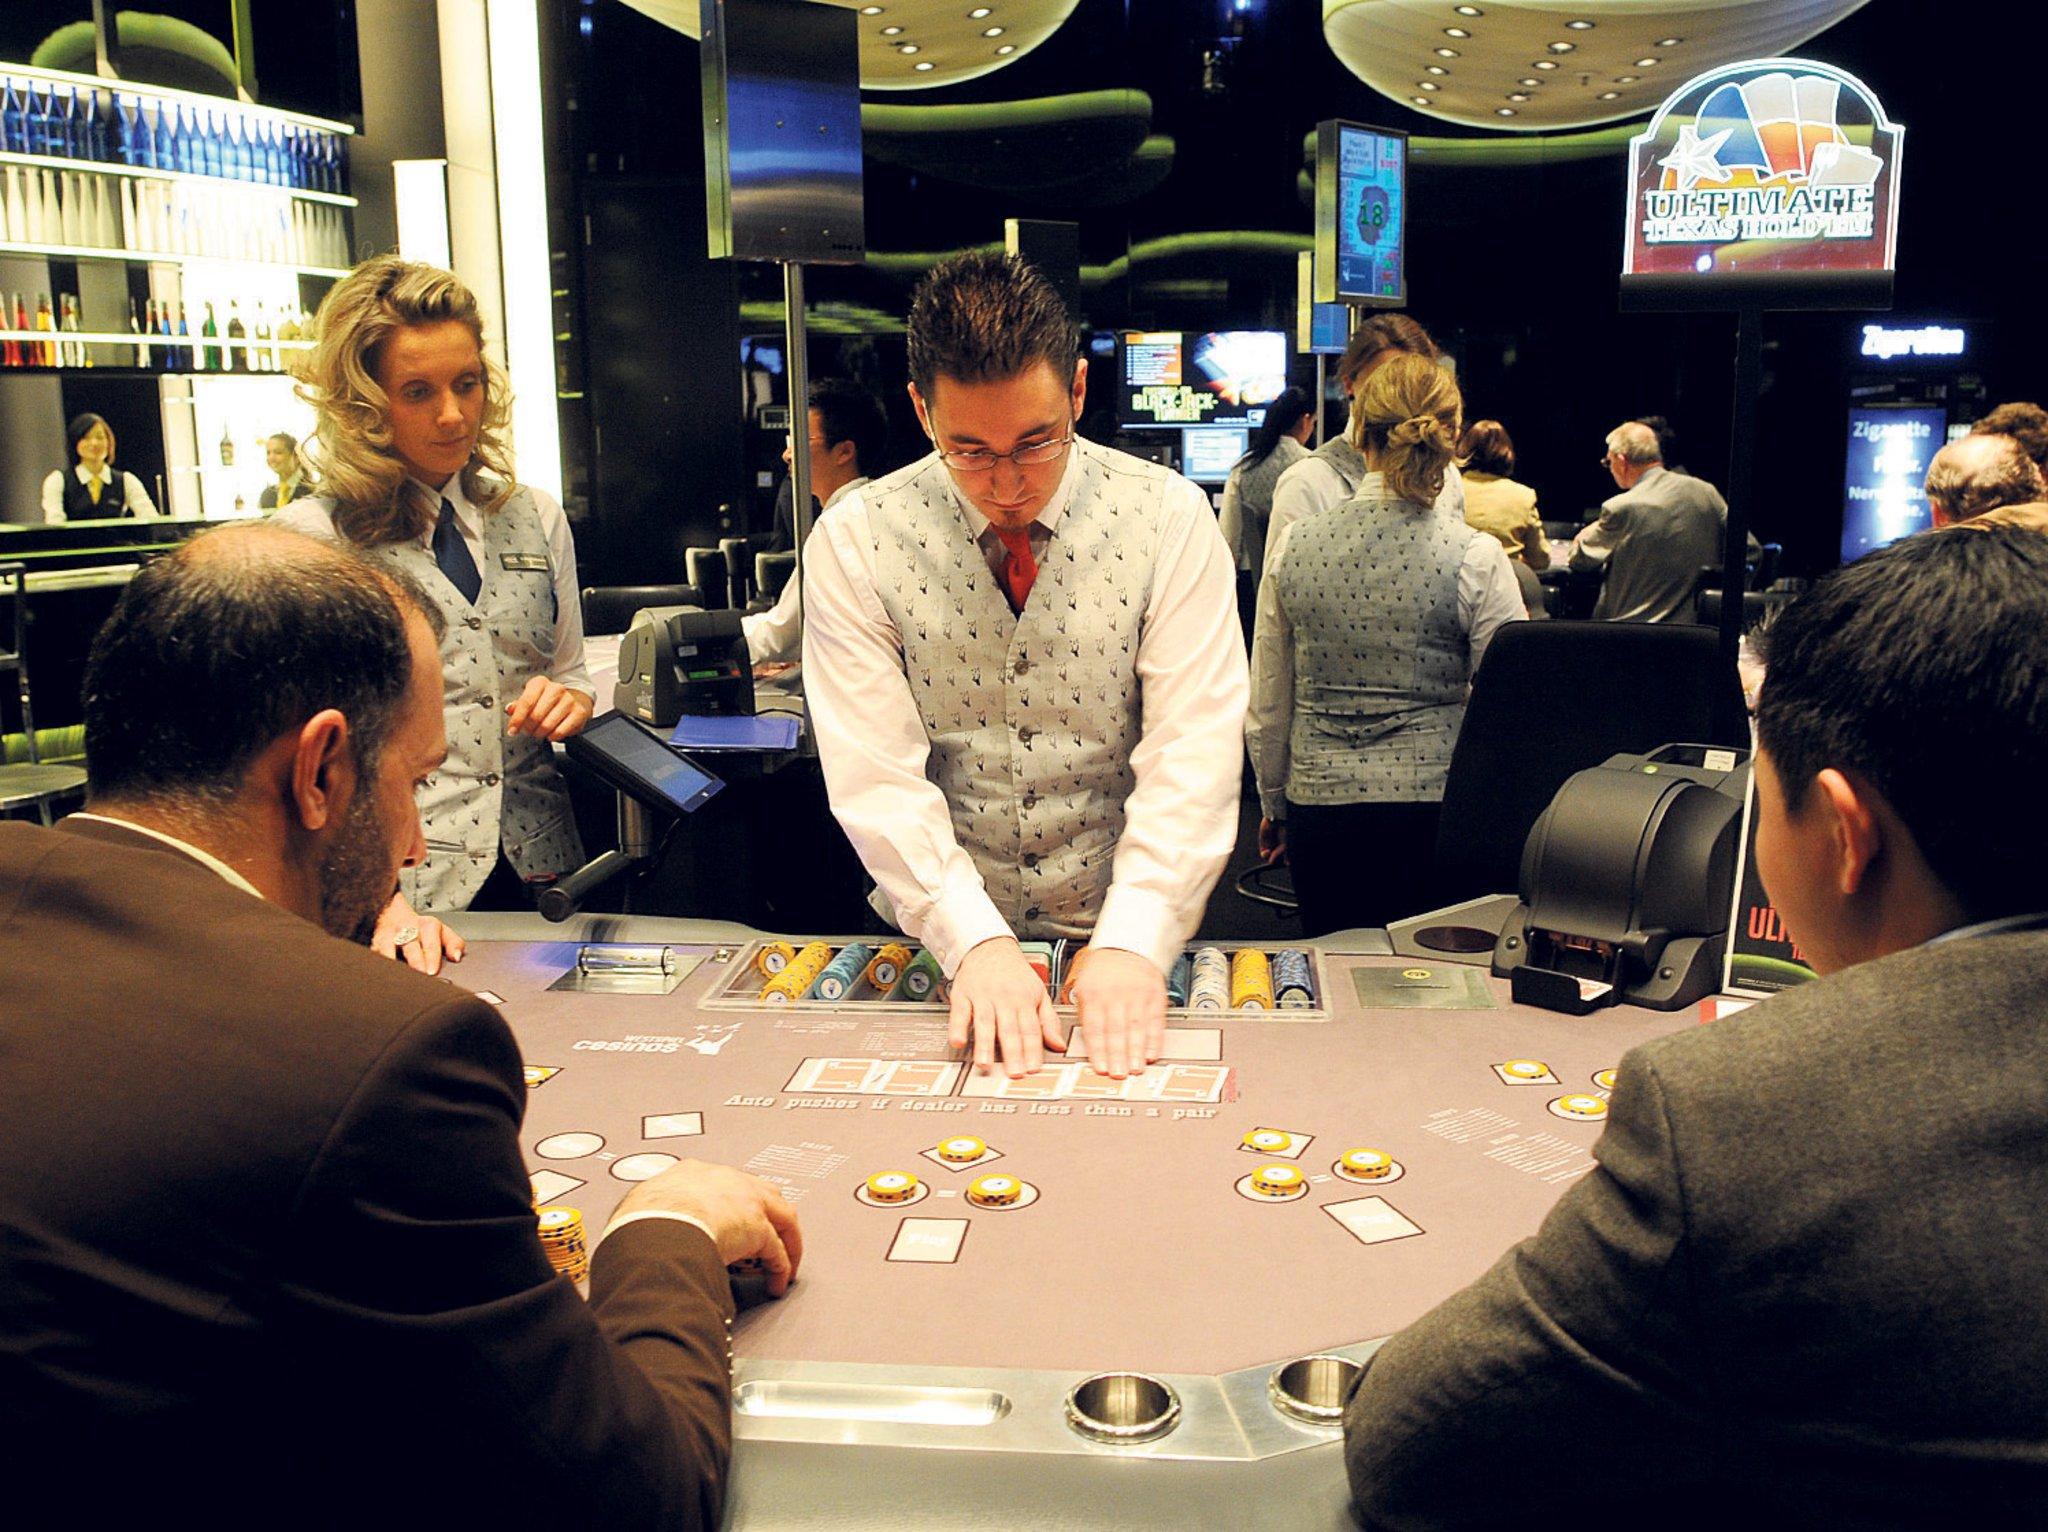 Casino In Duisburg